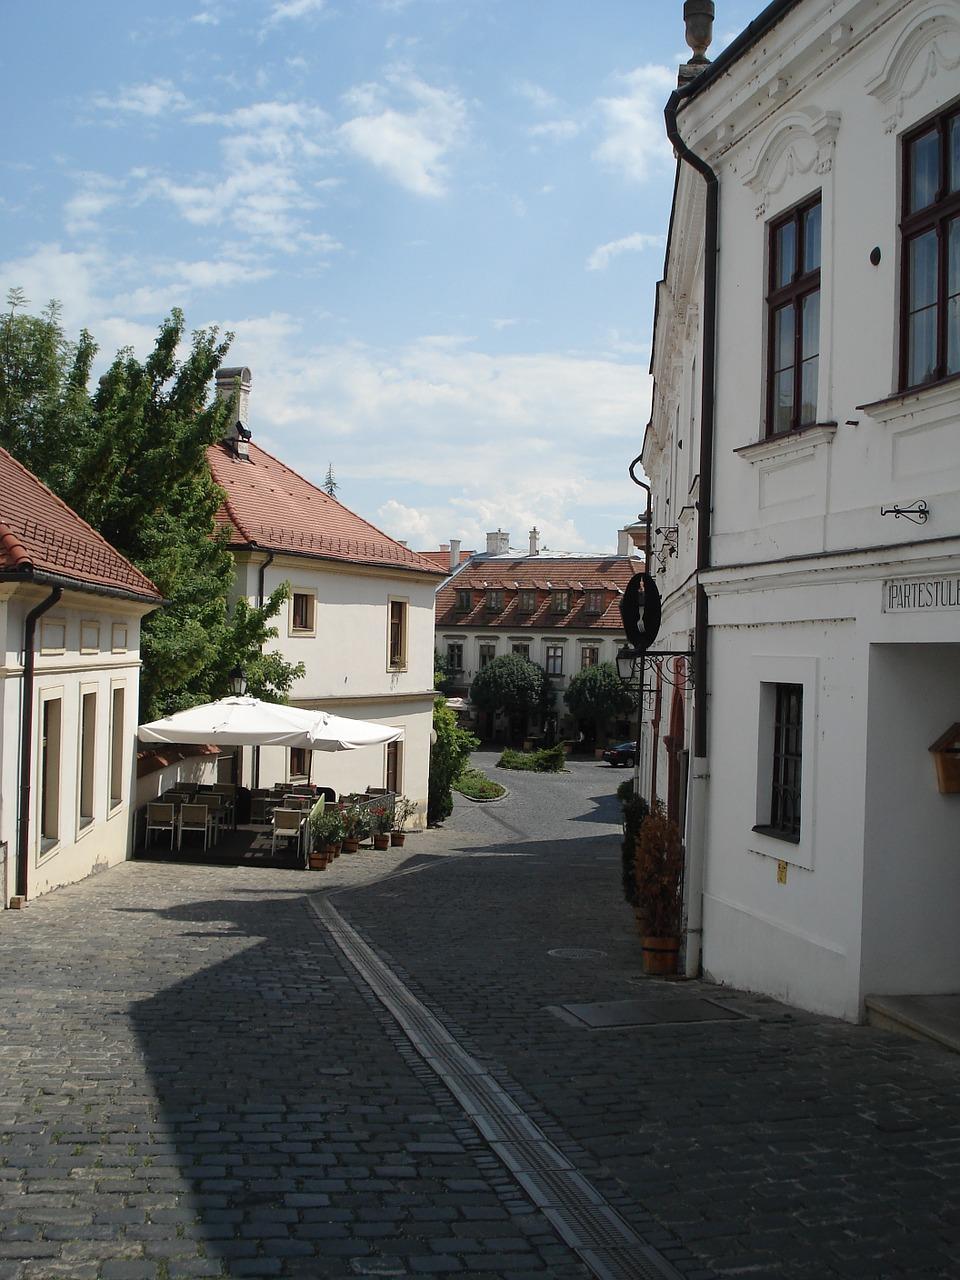 Veszprém - little street leading to the castle